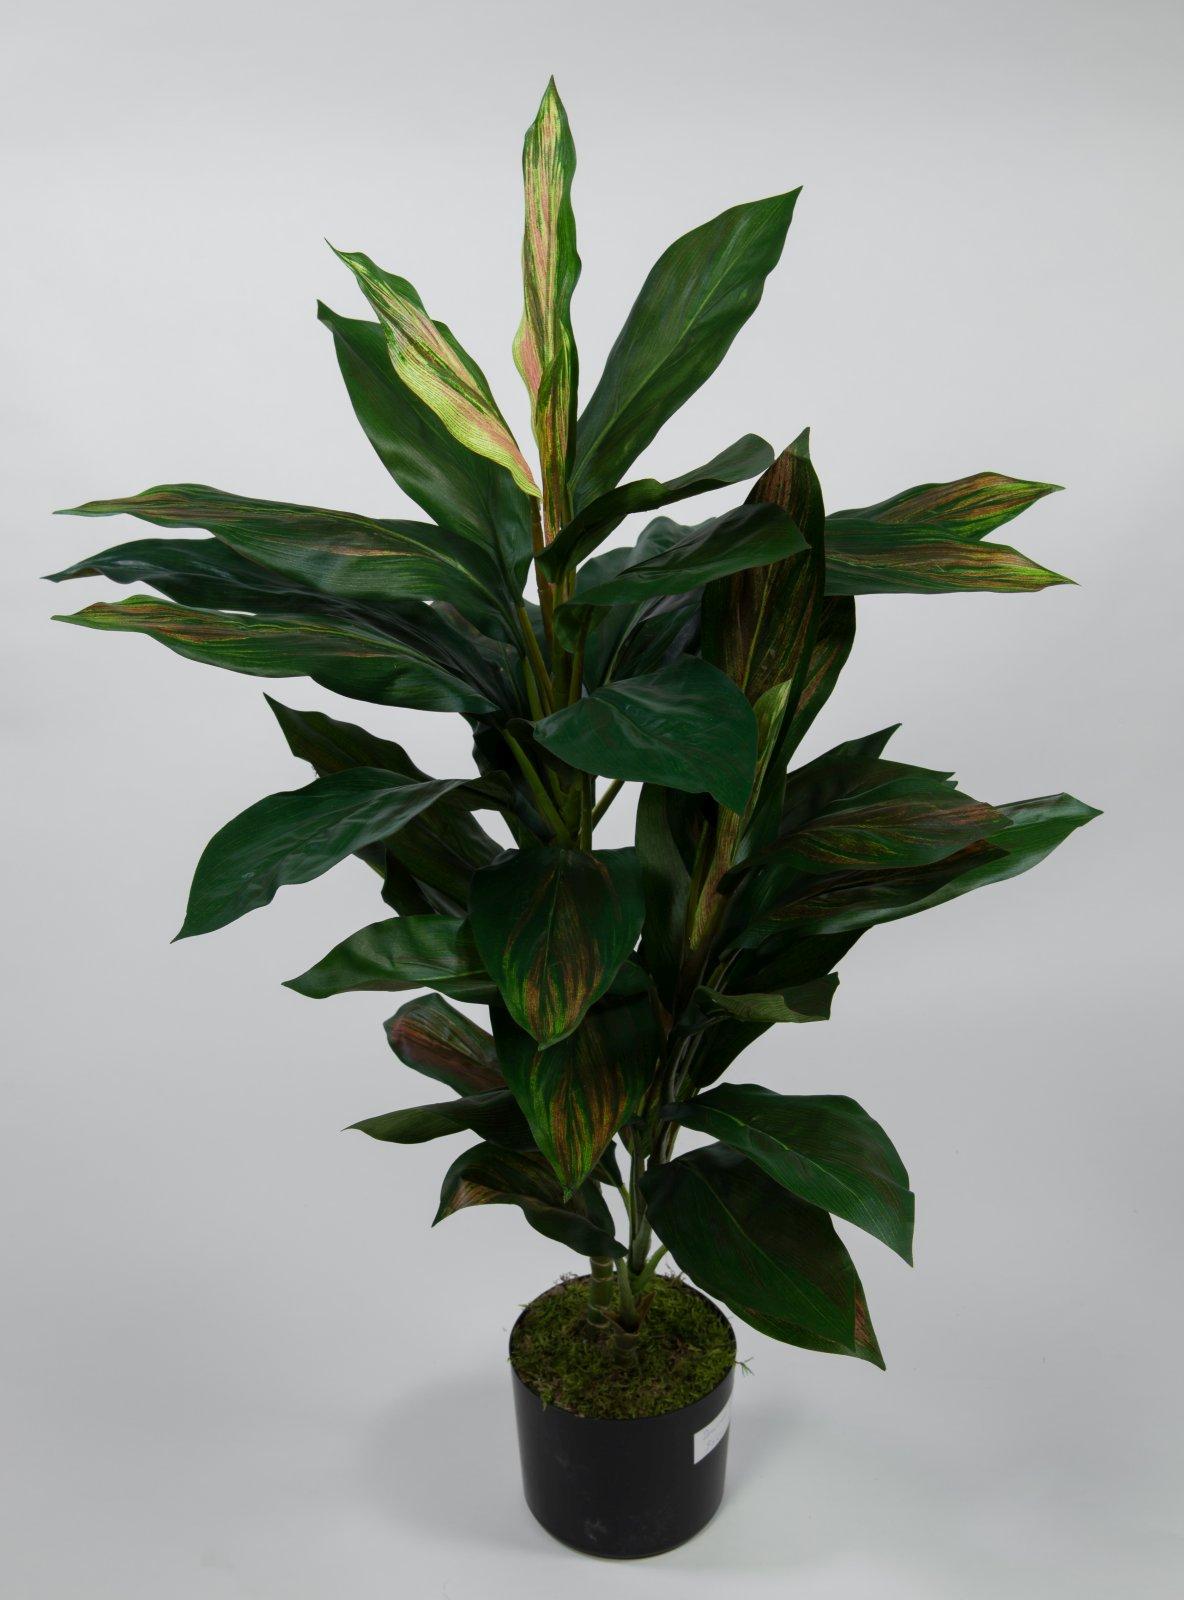 dracena drachenpalme 95cm nt k nstliche palmen kunstpflanzen kunstpalmen ebay. Black Bedroom Furniture Sets. Home Design Ideas